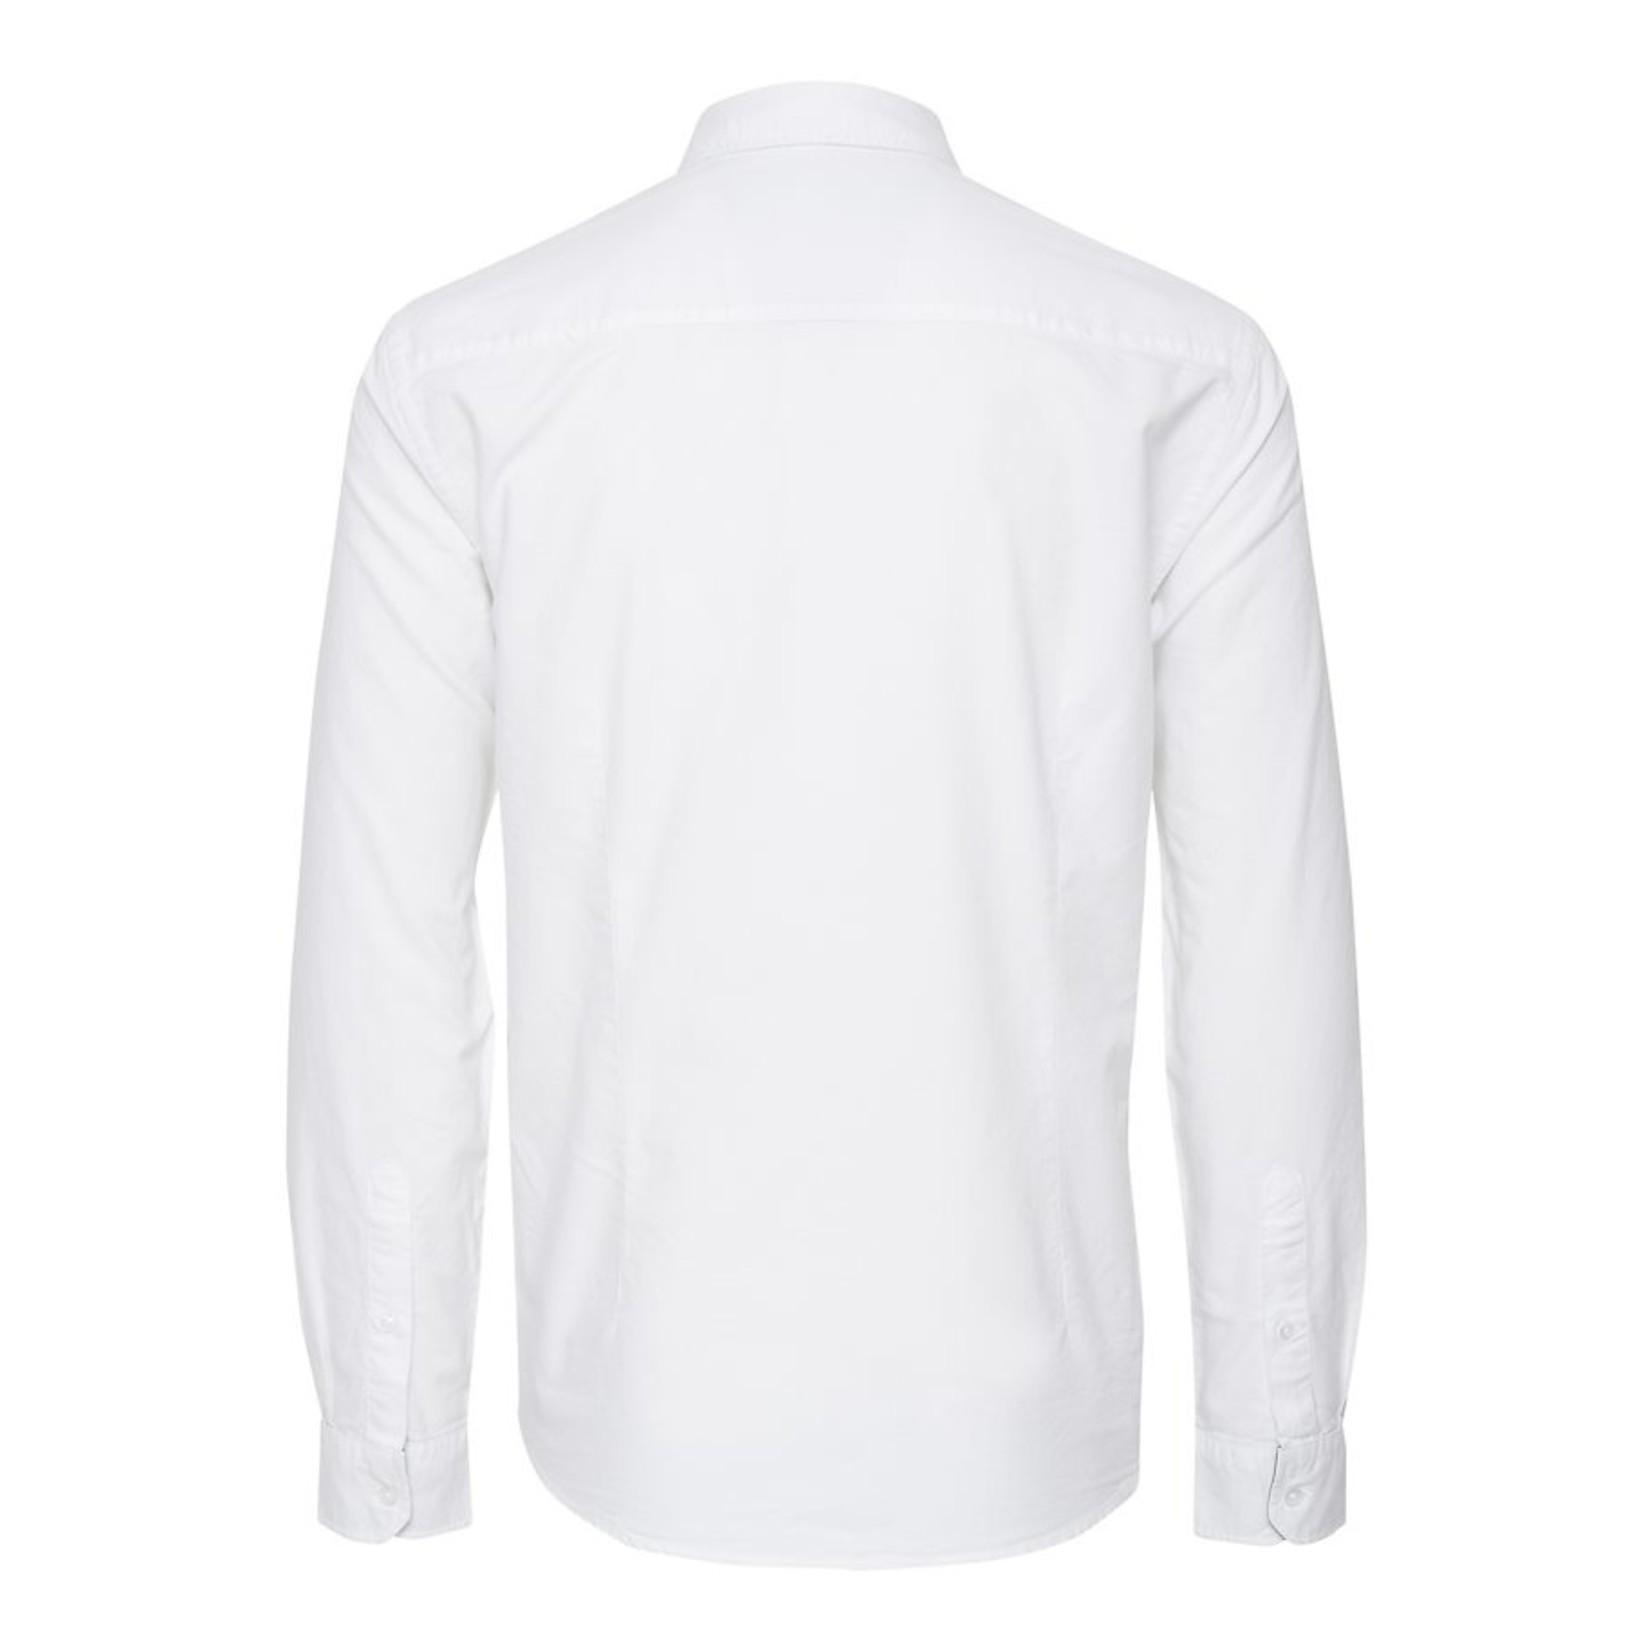 Blend Blend 20709454 BHNAIL White Long-Sleeve Button-Up Slim Fit Shirt